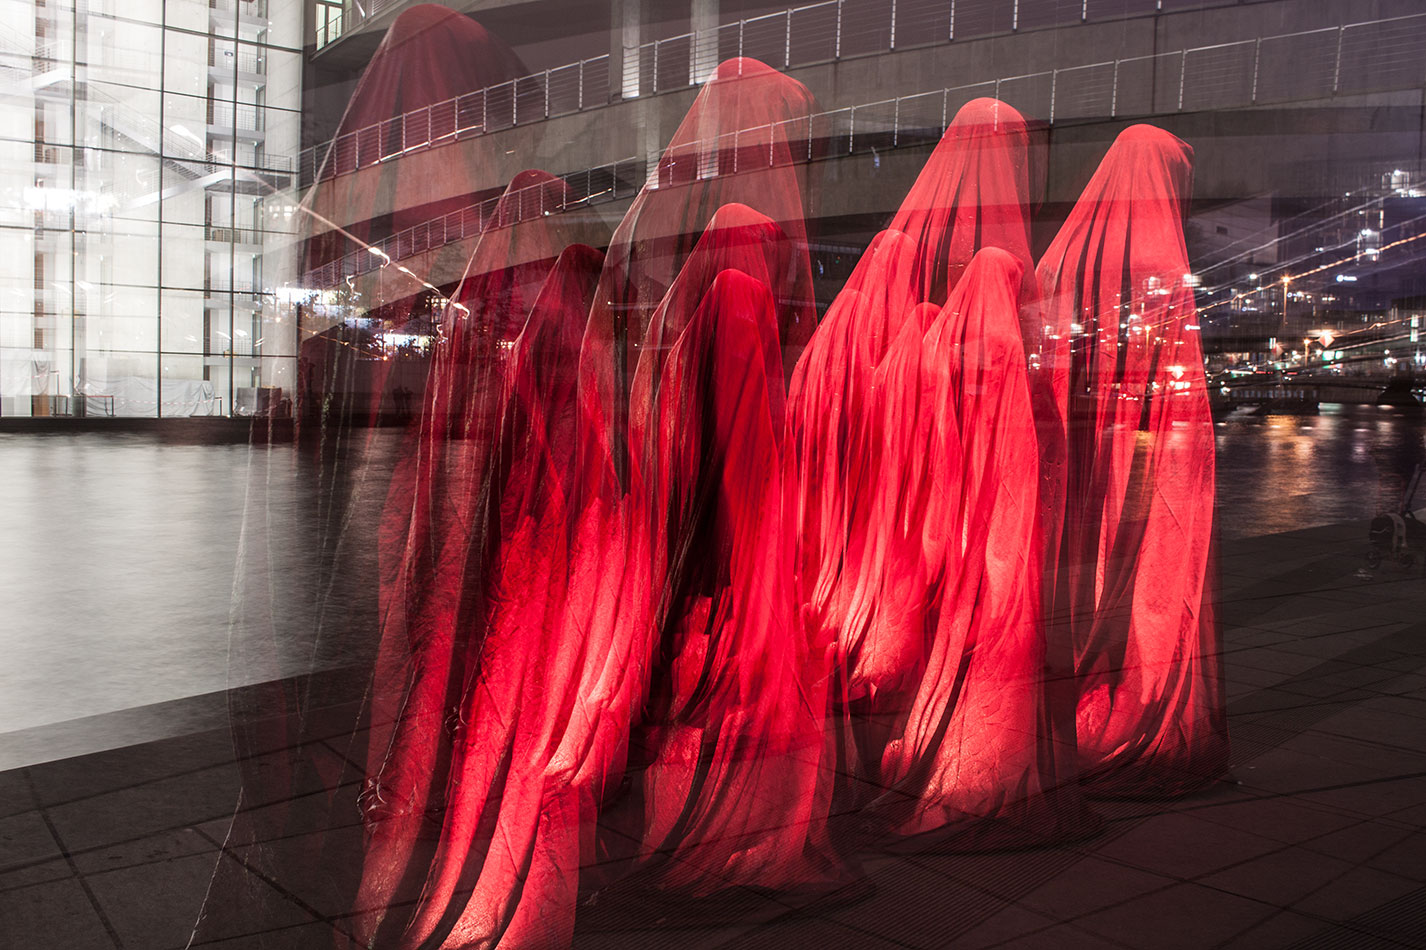 25-years-wallfall-berlin-germany-contemporary-fine-art-show-arts-design-sculpture-public-arts-arte-antique-guardians-of-time-manfred-kili-kielnhofer-4705